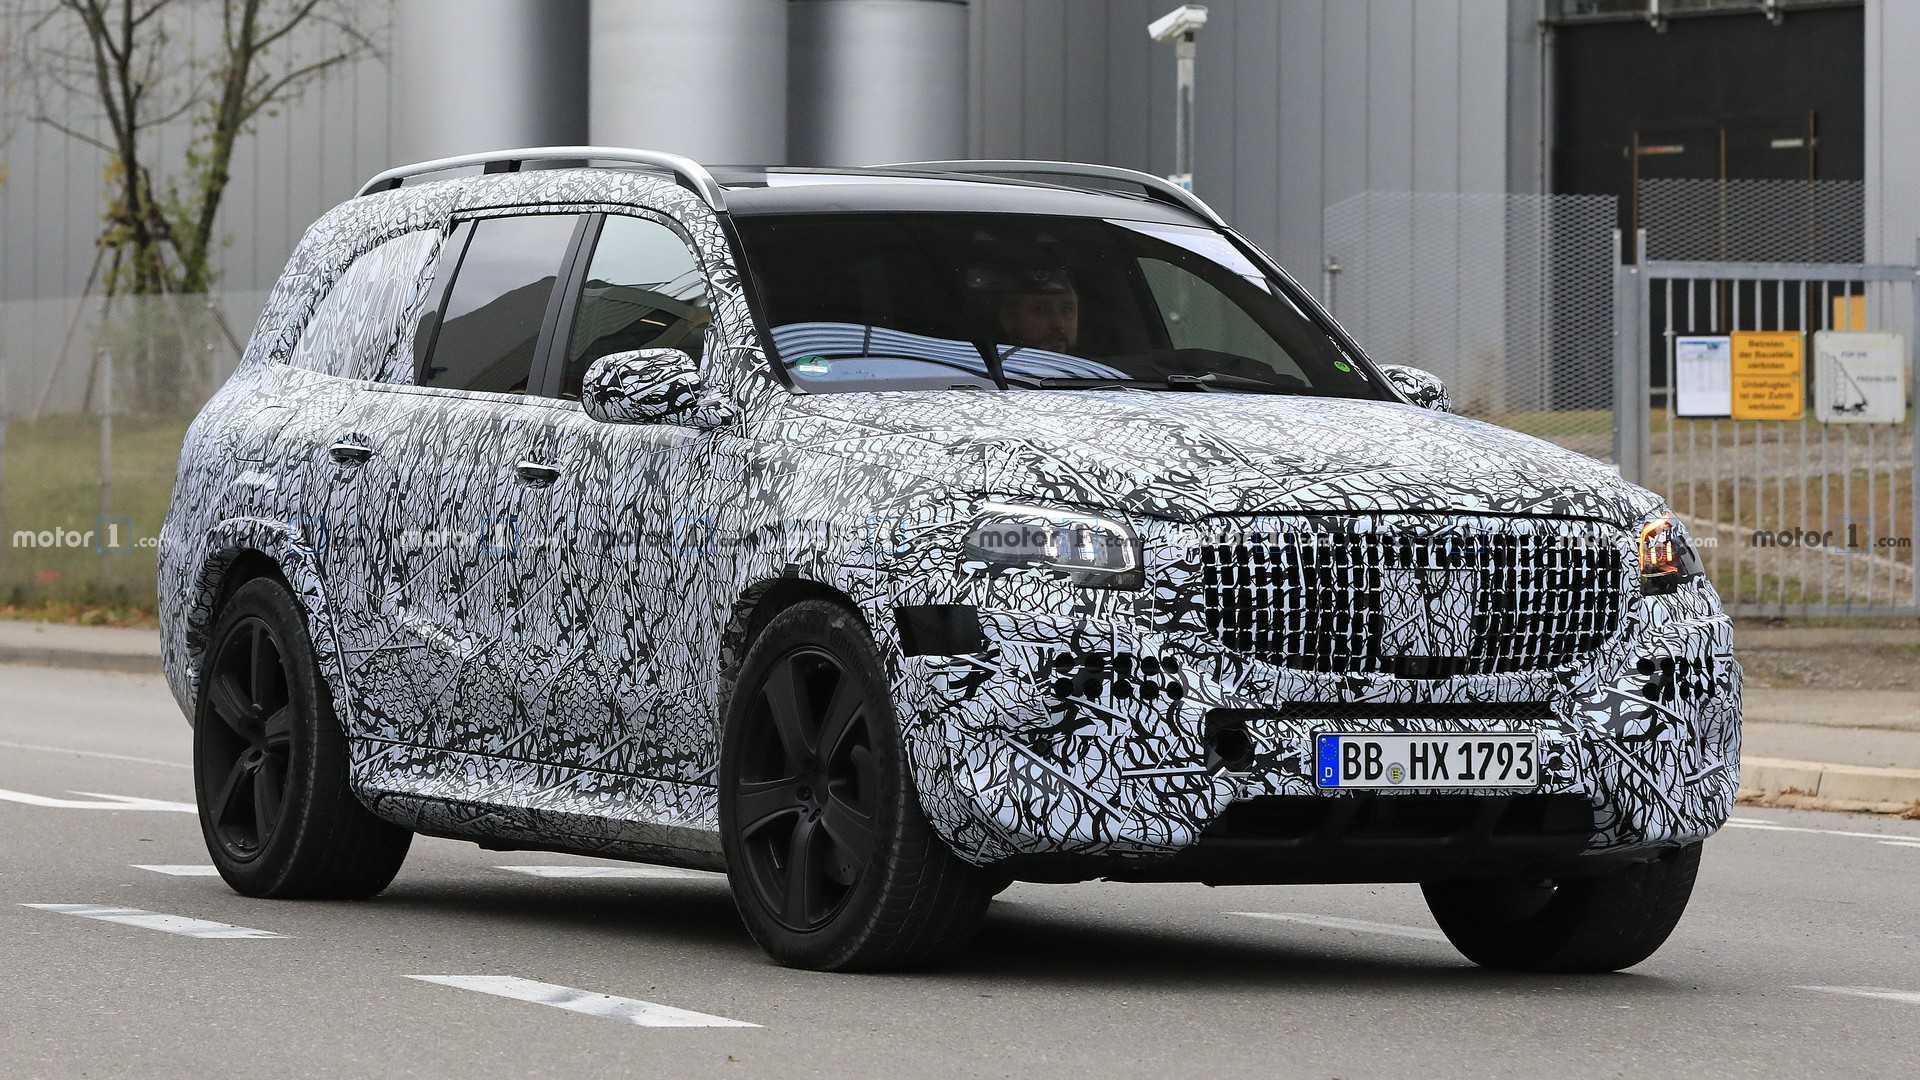 2020 Mercedes-Maybach Spy Photo